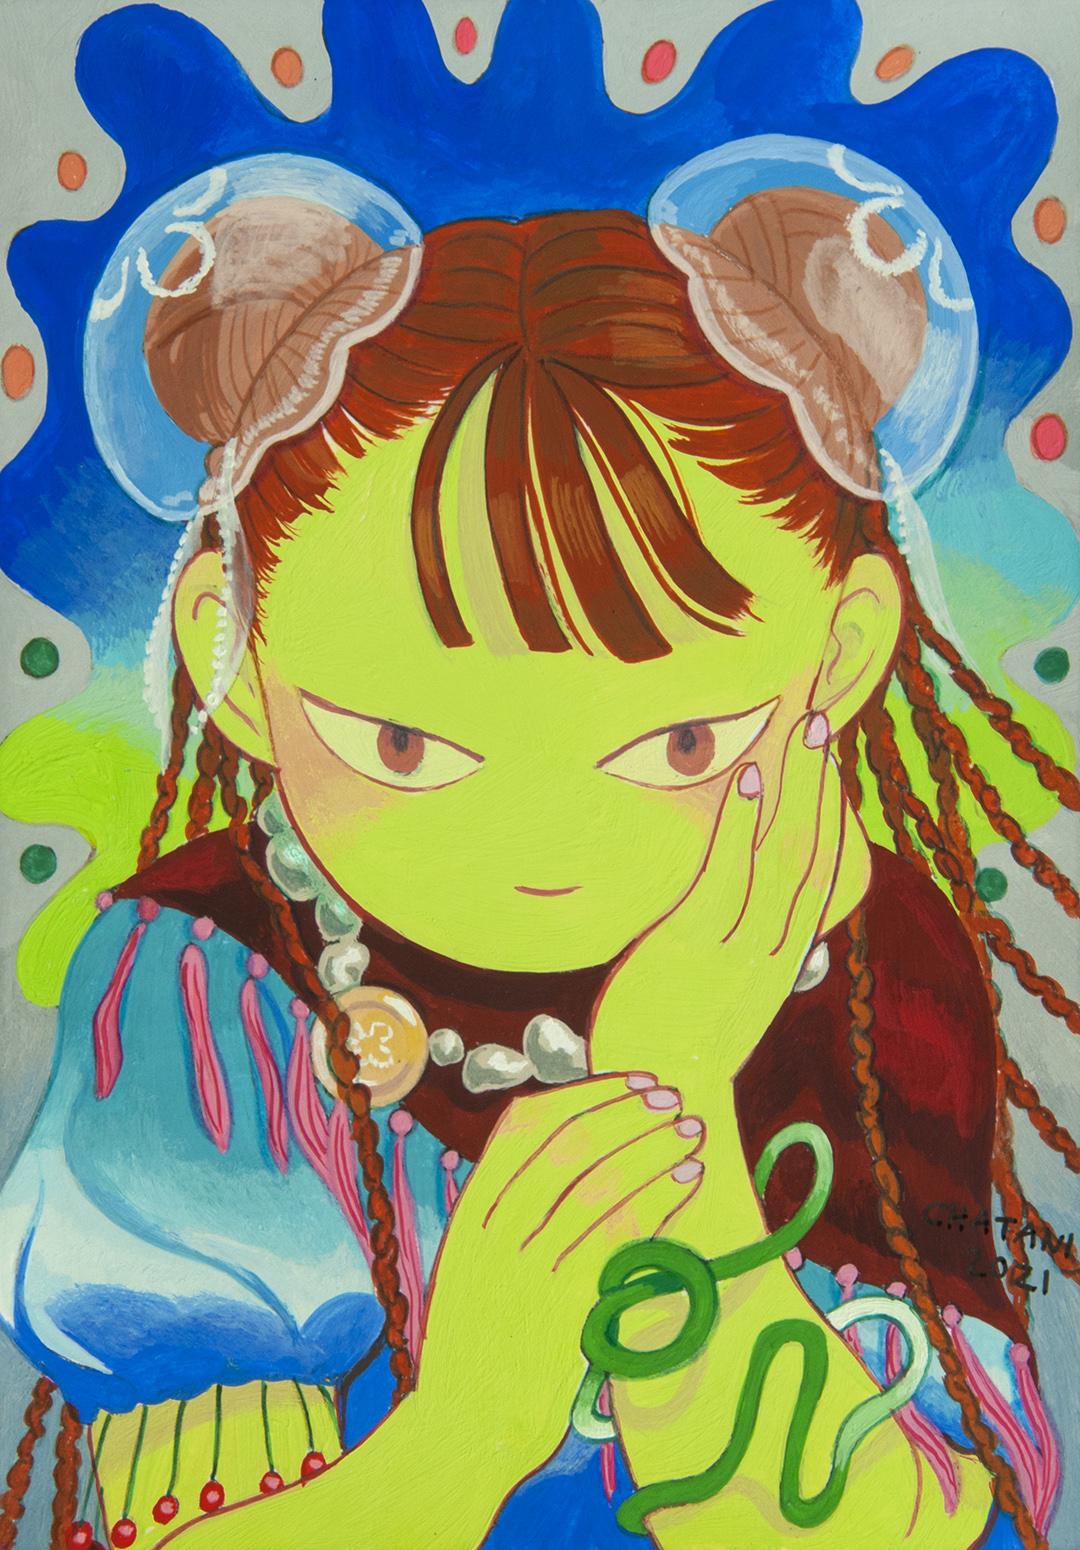 GirlsclubAsia-Artist-Hana Chatani-image 09